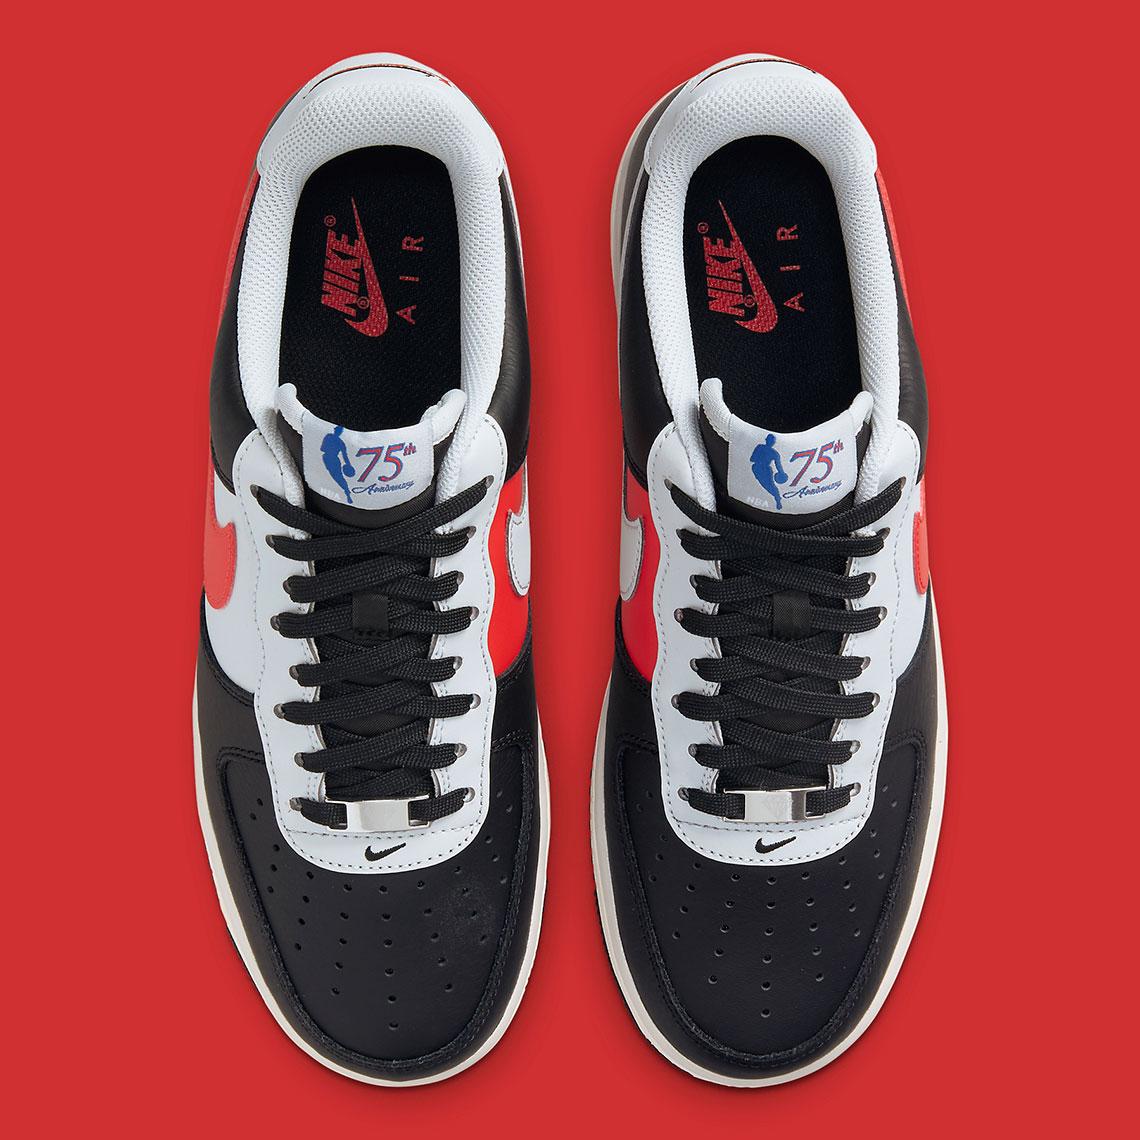 NBA x Nike Air Force 1 Low 75th Anniversary